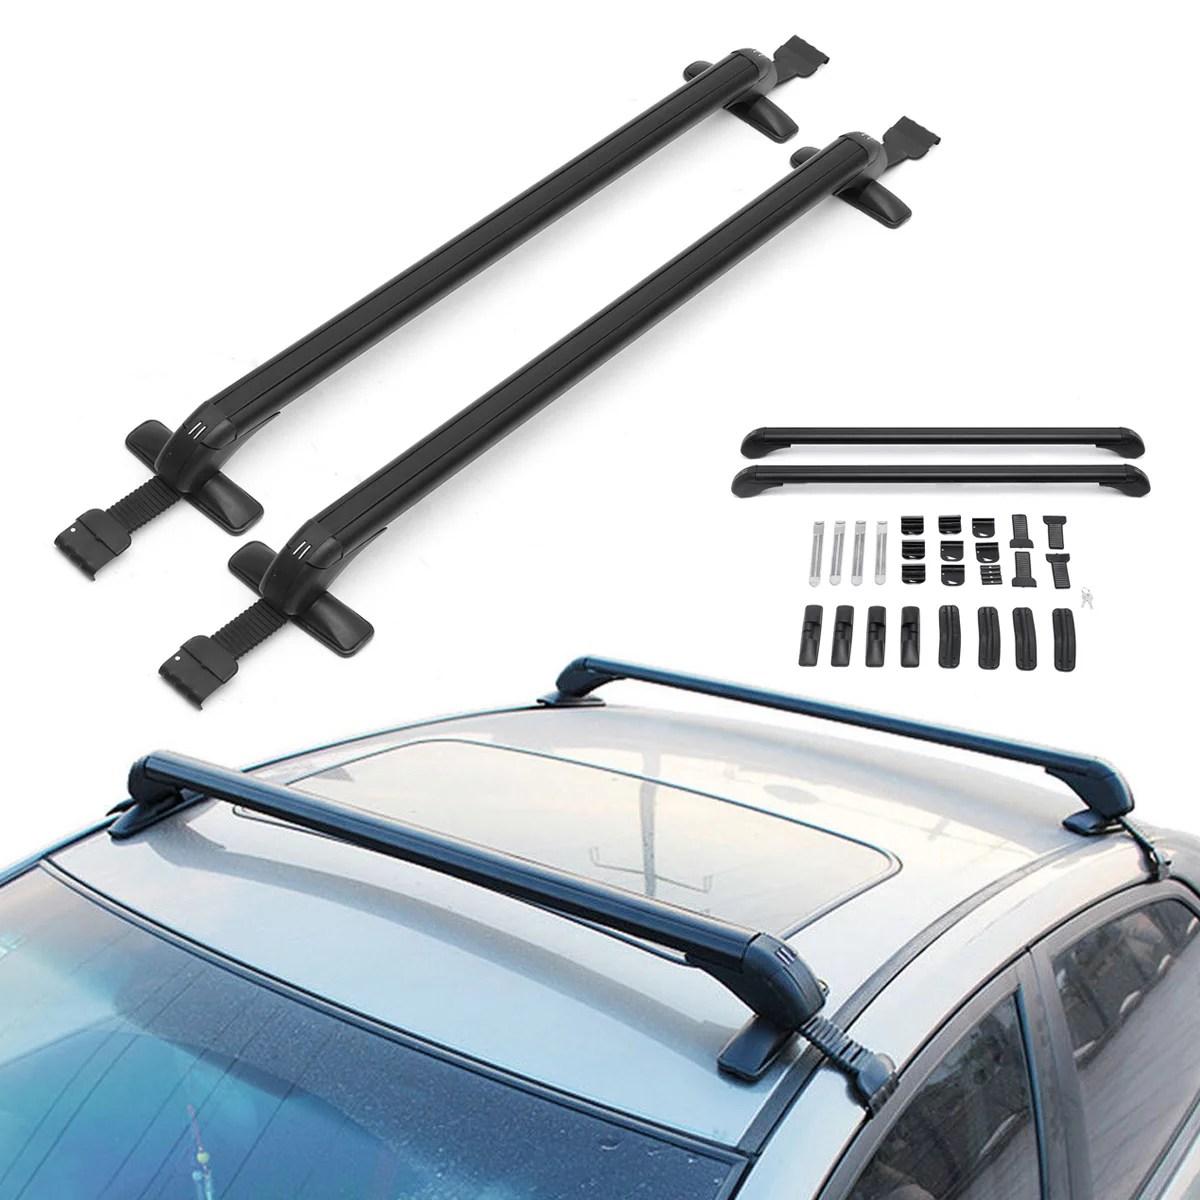 car roof rack cross bars top luggage holder cargo carrier for car roof 41 3 43 anti theft lockable adjustable 331 lb capacity walmart com